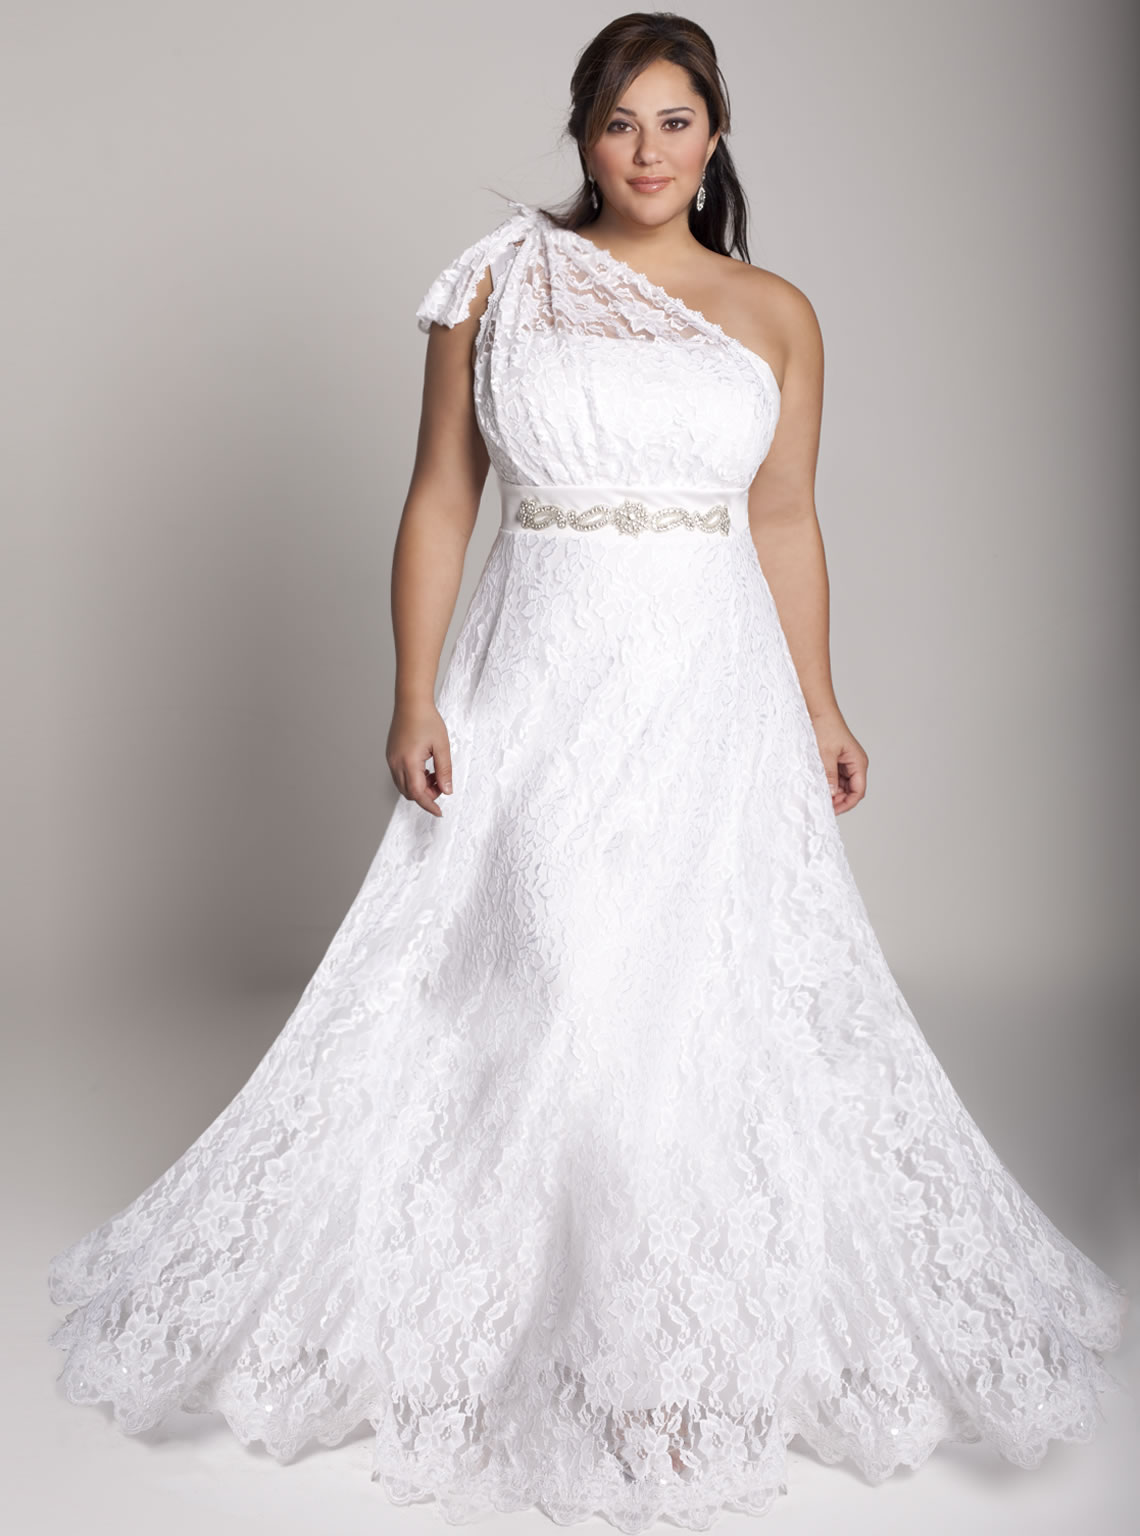 10 Beautiful Plus Size Wedding Dresses 09